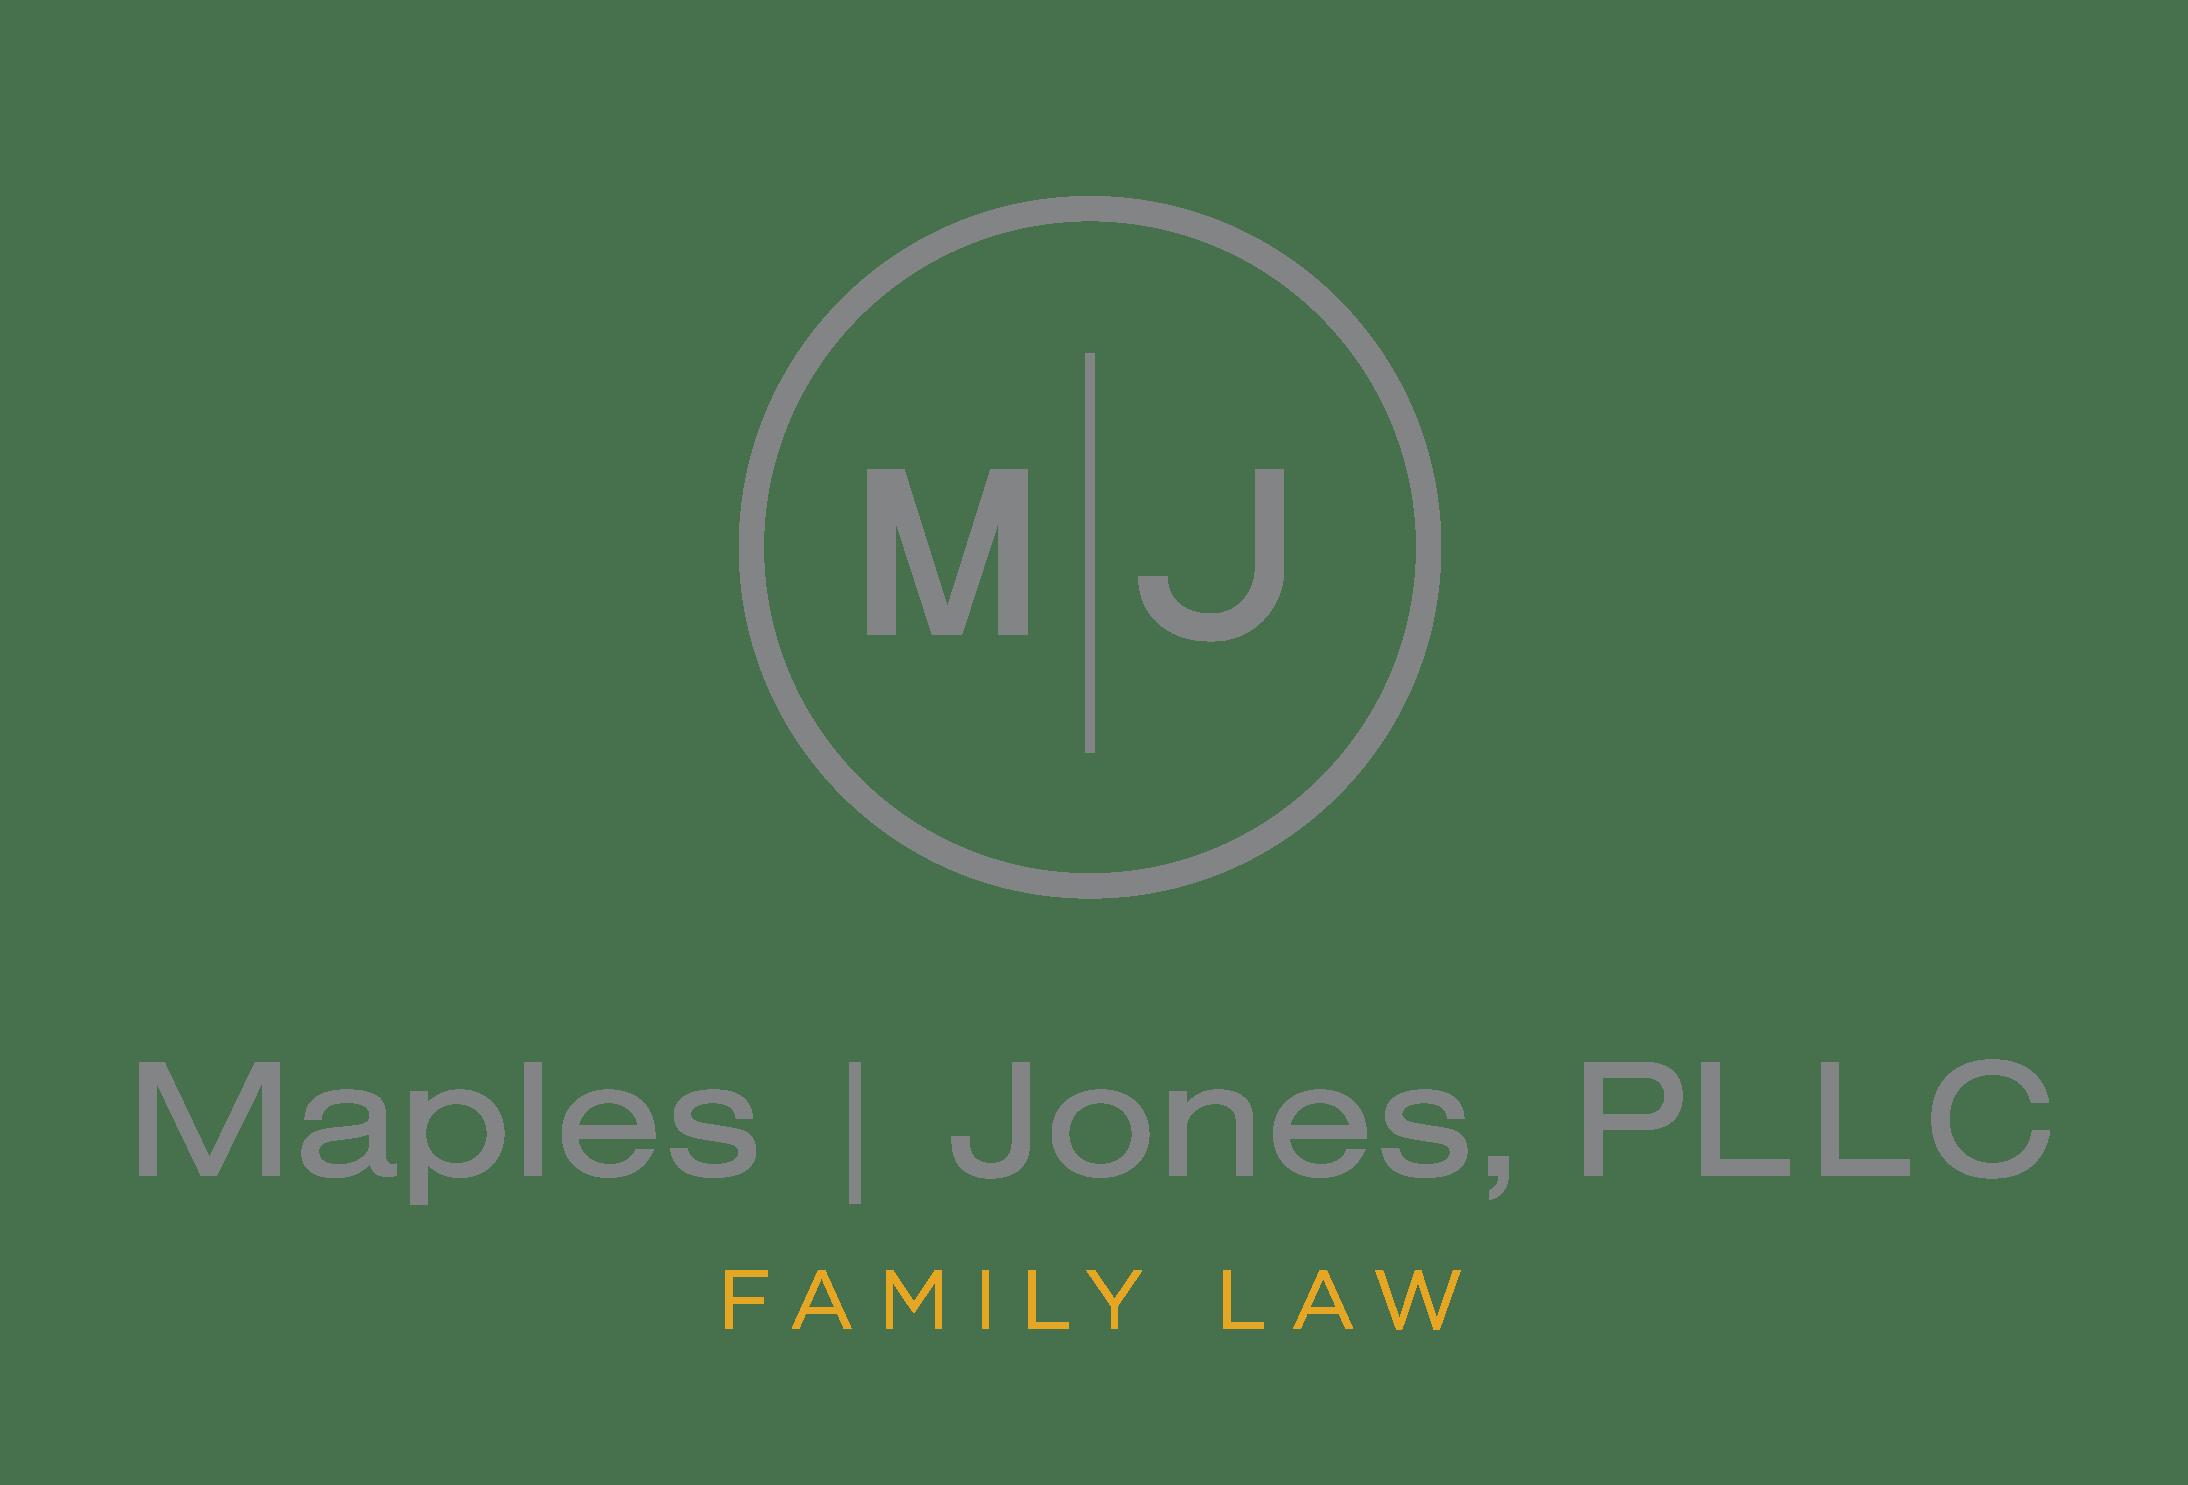 Maples | Jones, PLLC Family Law Logo